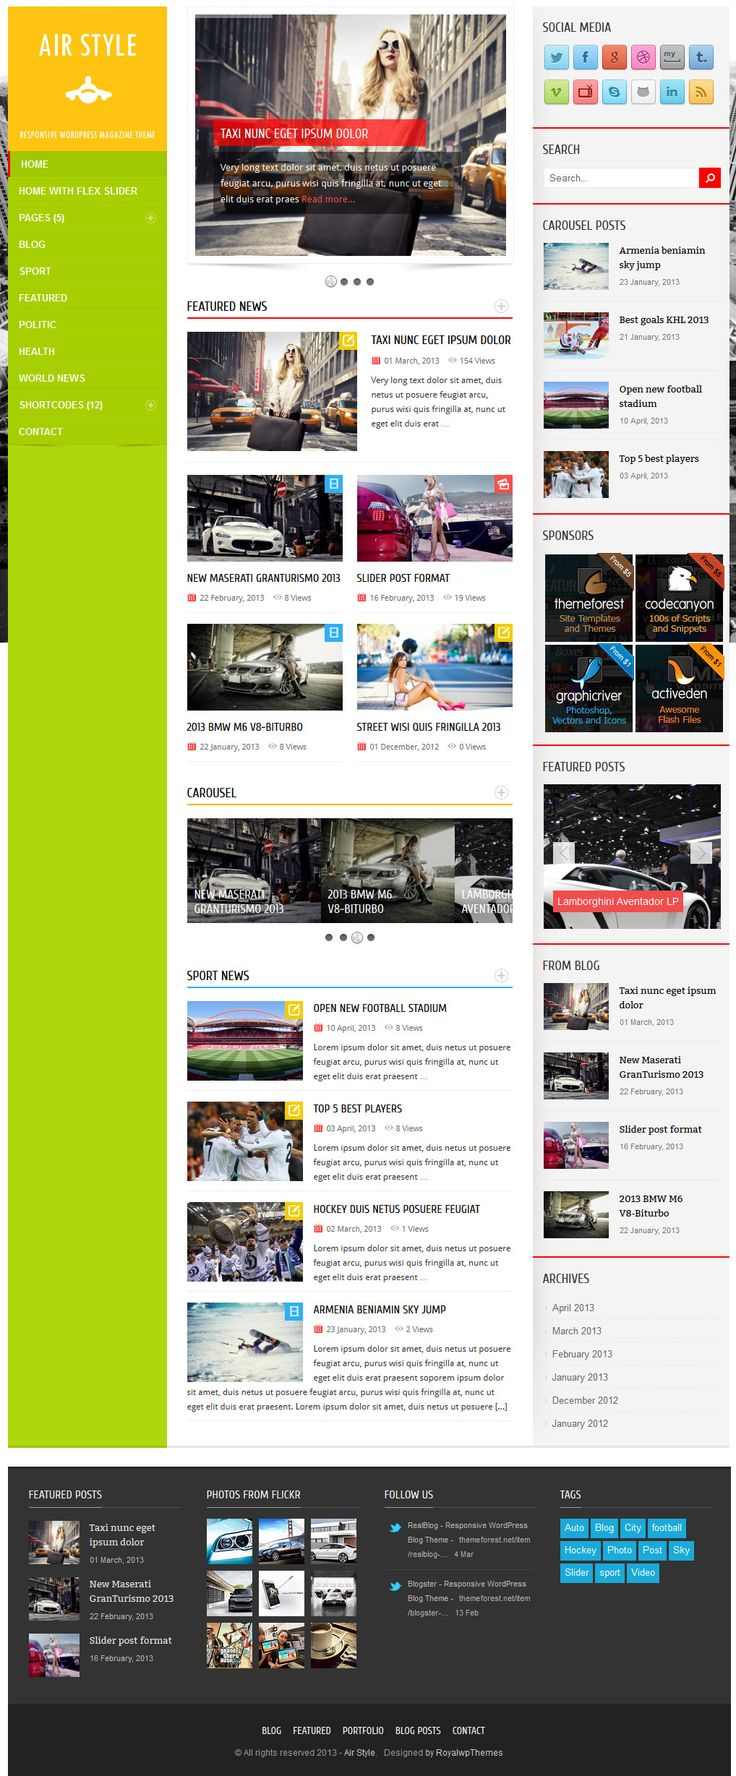 Air Style - Responsive WordPress Magazine Theme - #wordpress #theme #template #responsive #design #webdesign #magazine #blog